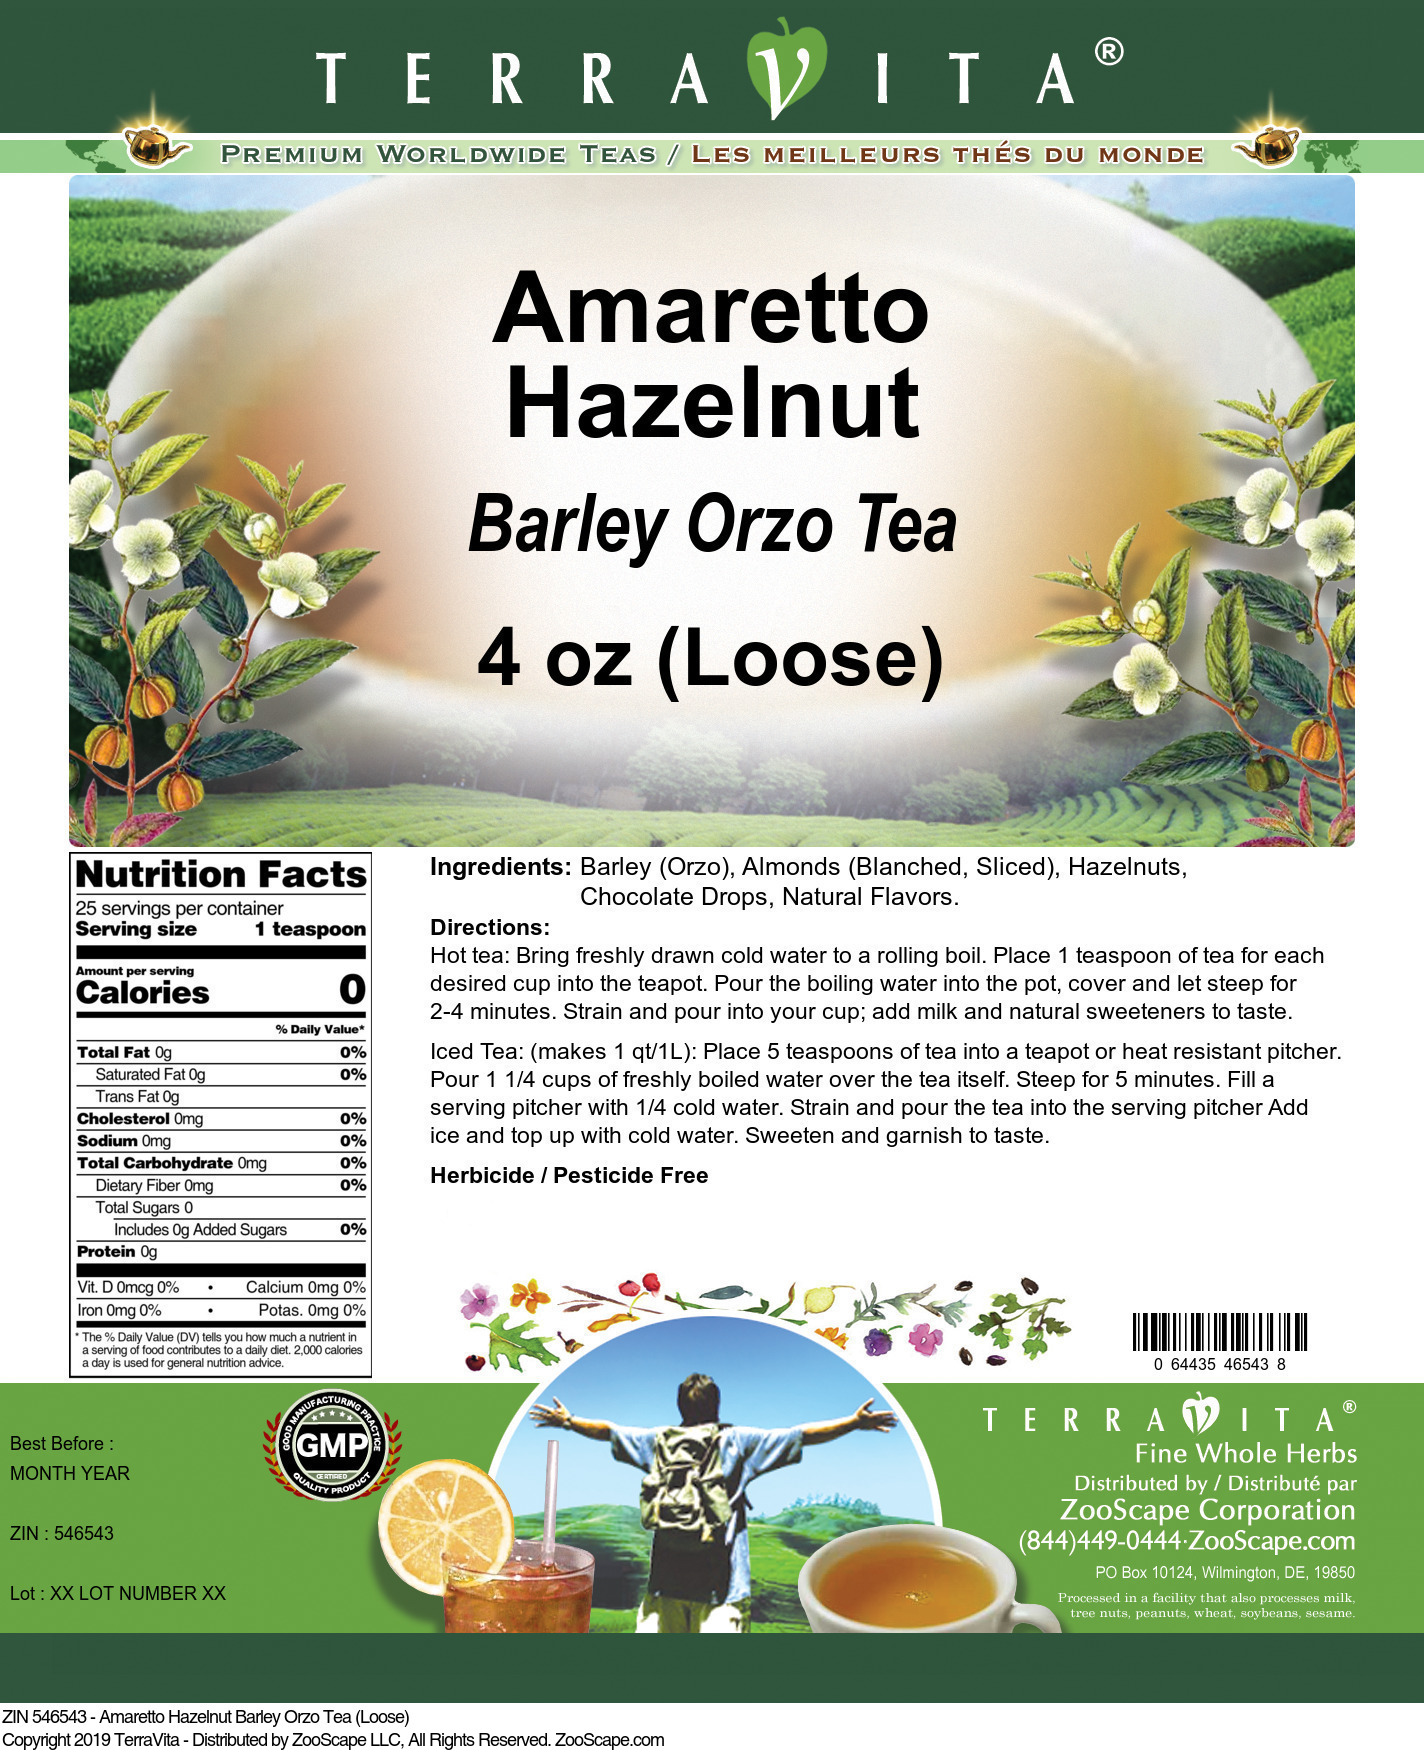 Amaretto Hazelnut Barley Orzo Tea (Loose)